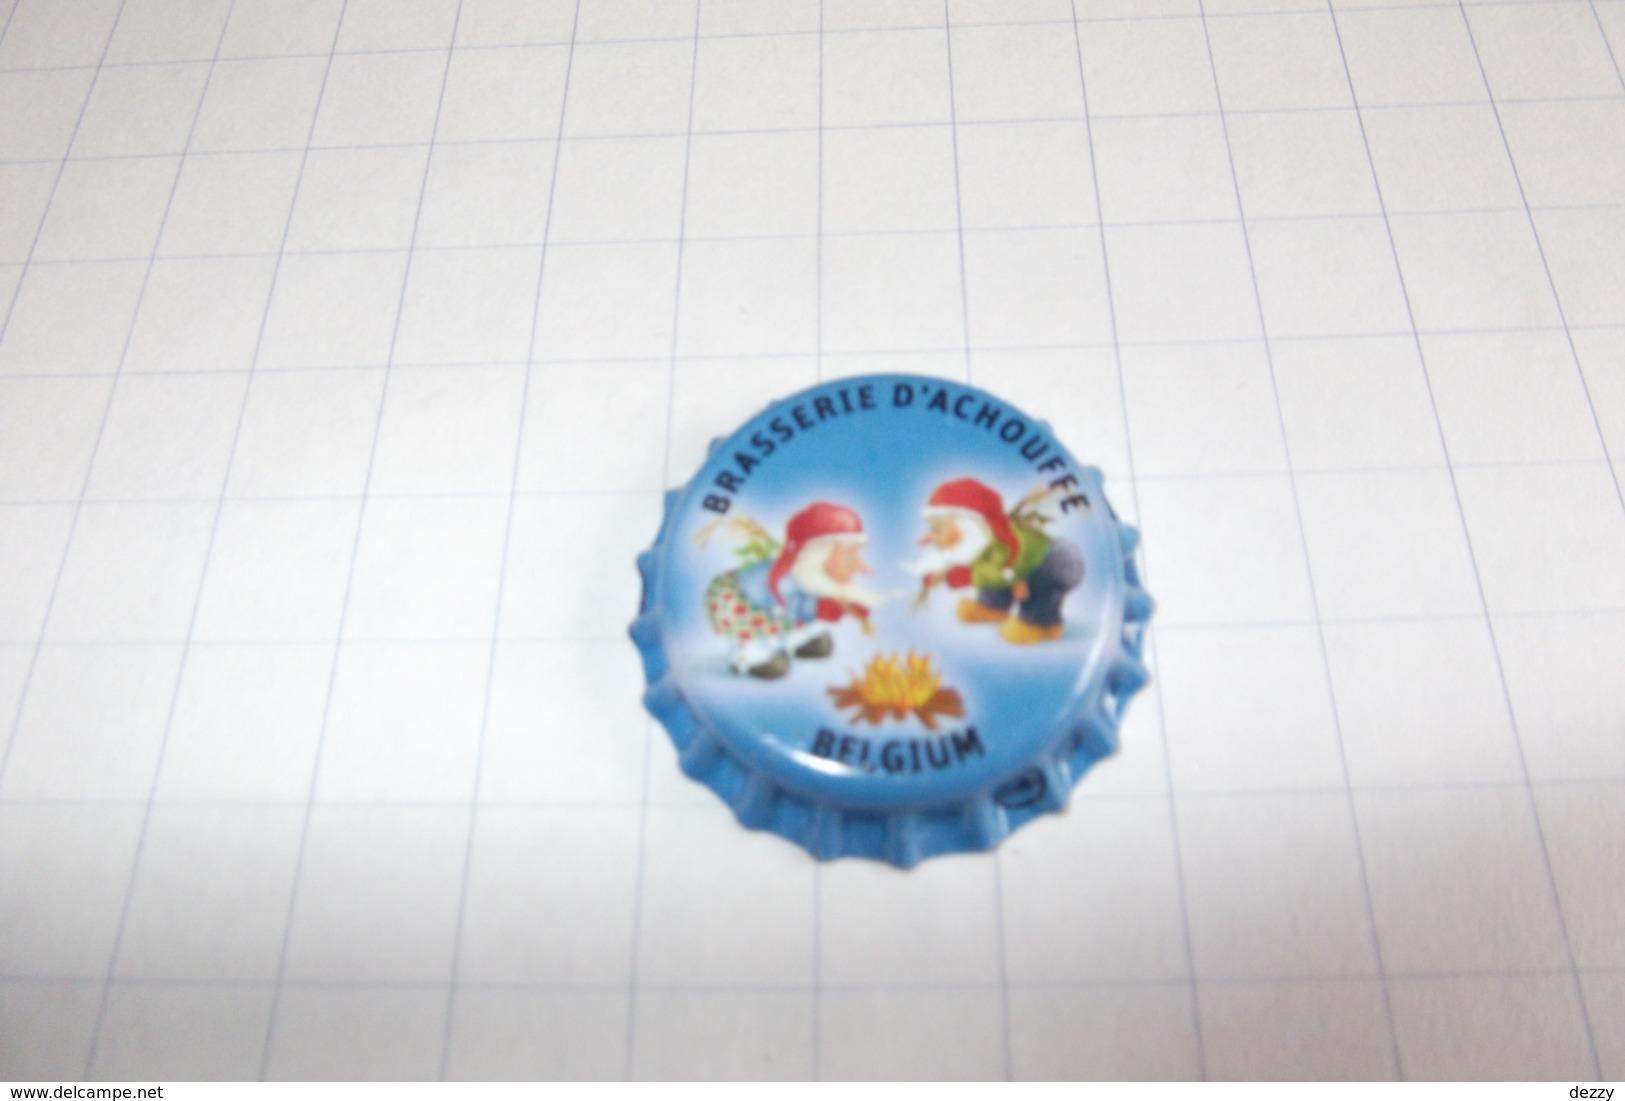 BEERCAPS BELGIUM/BIERDOPPEN BELGIË : D'ACHOUFFE N'ICE CHOUFFE - Birra